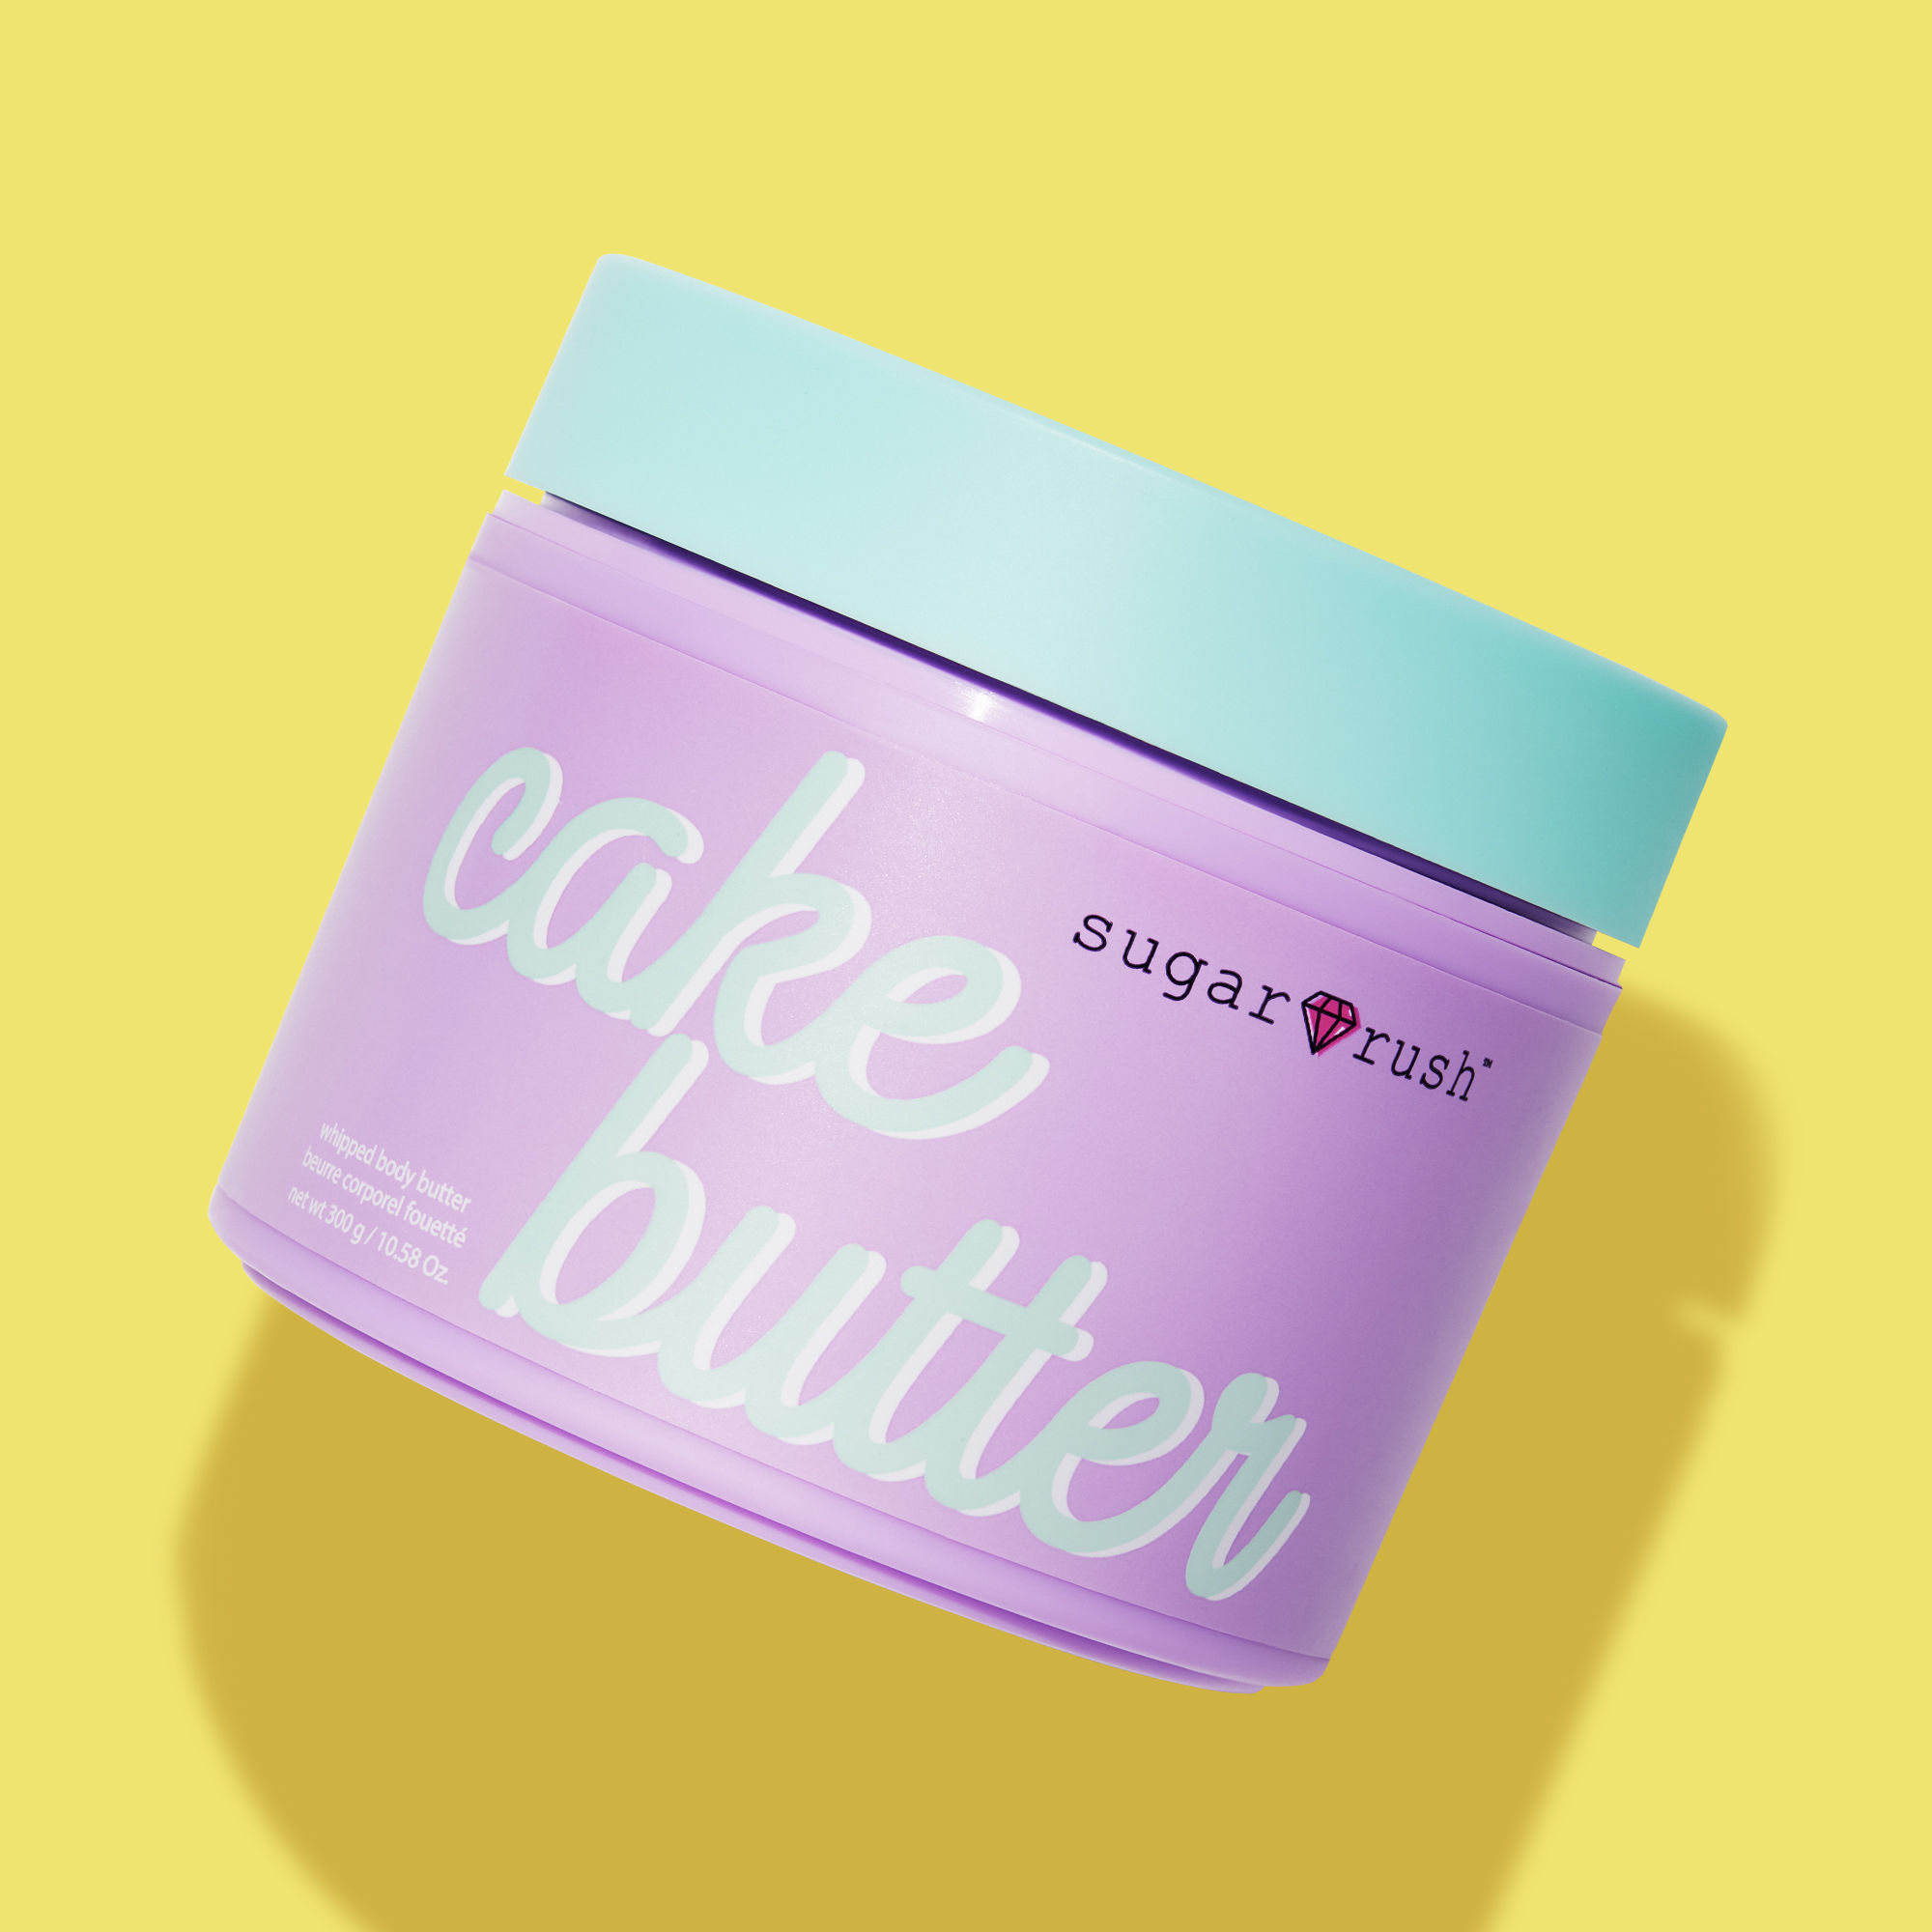 tarte/sugar rush